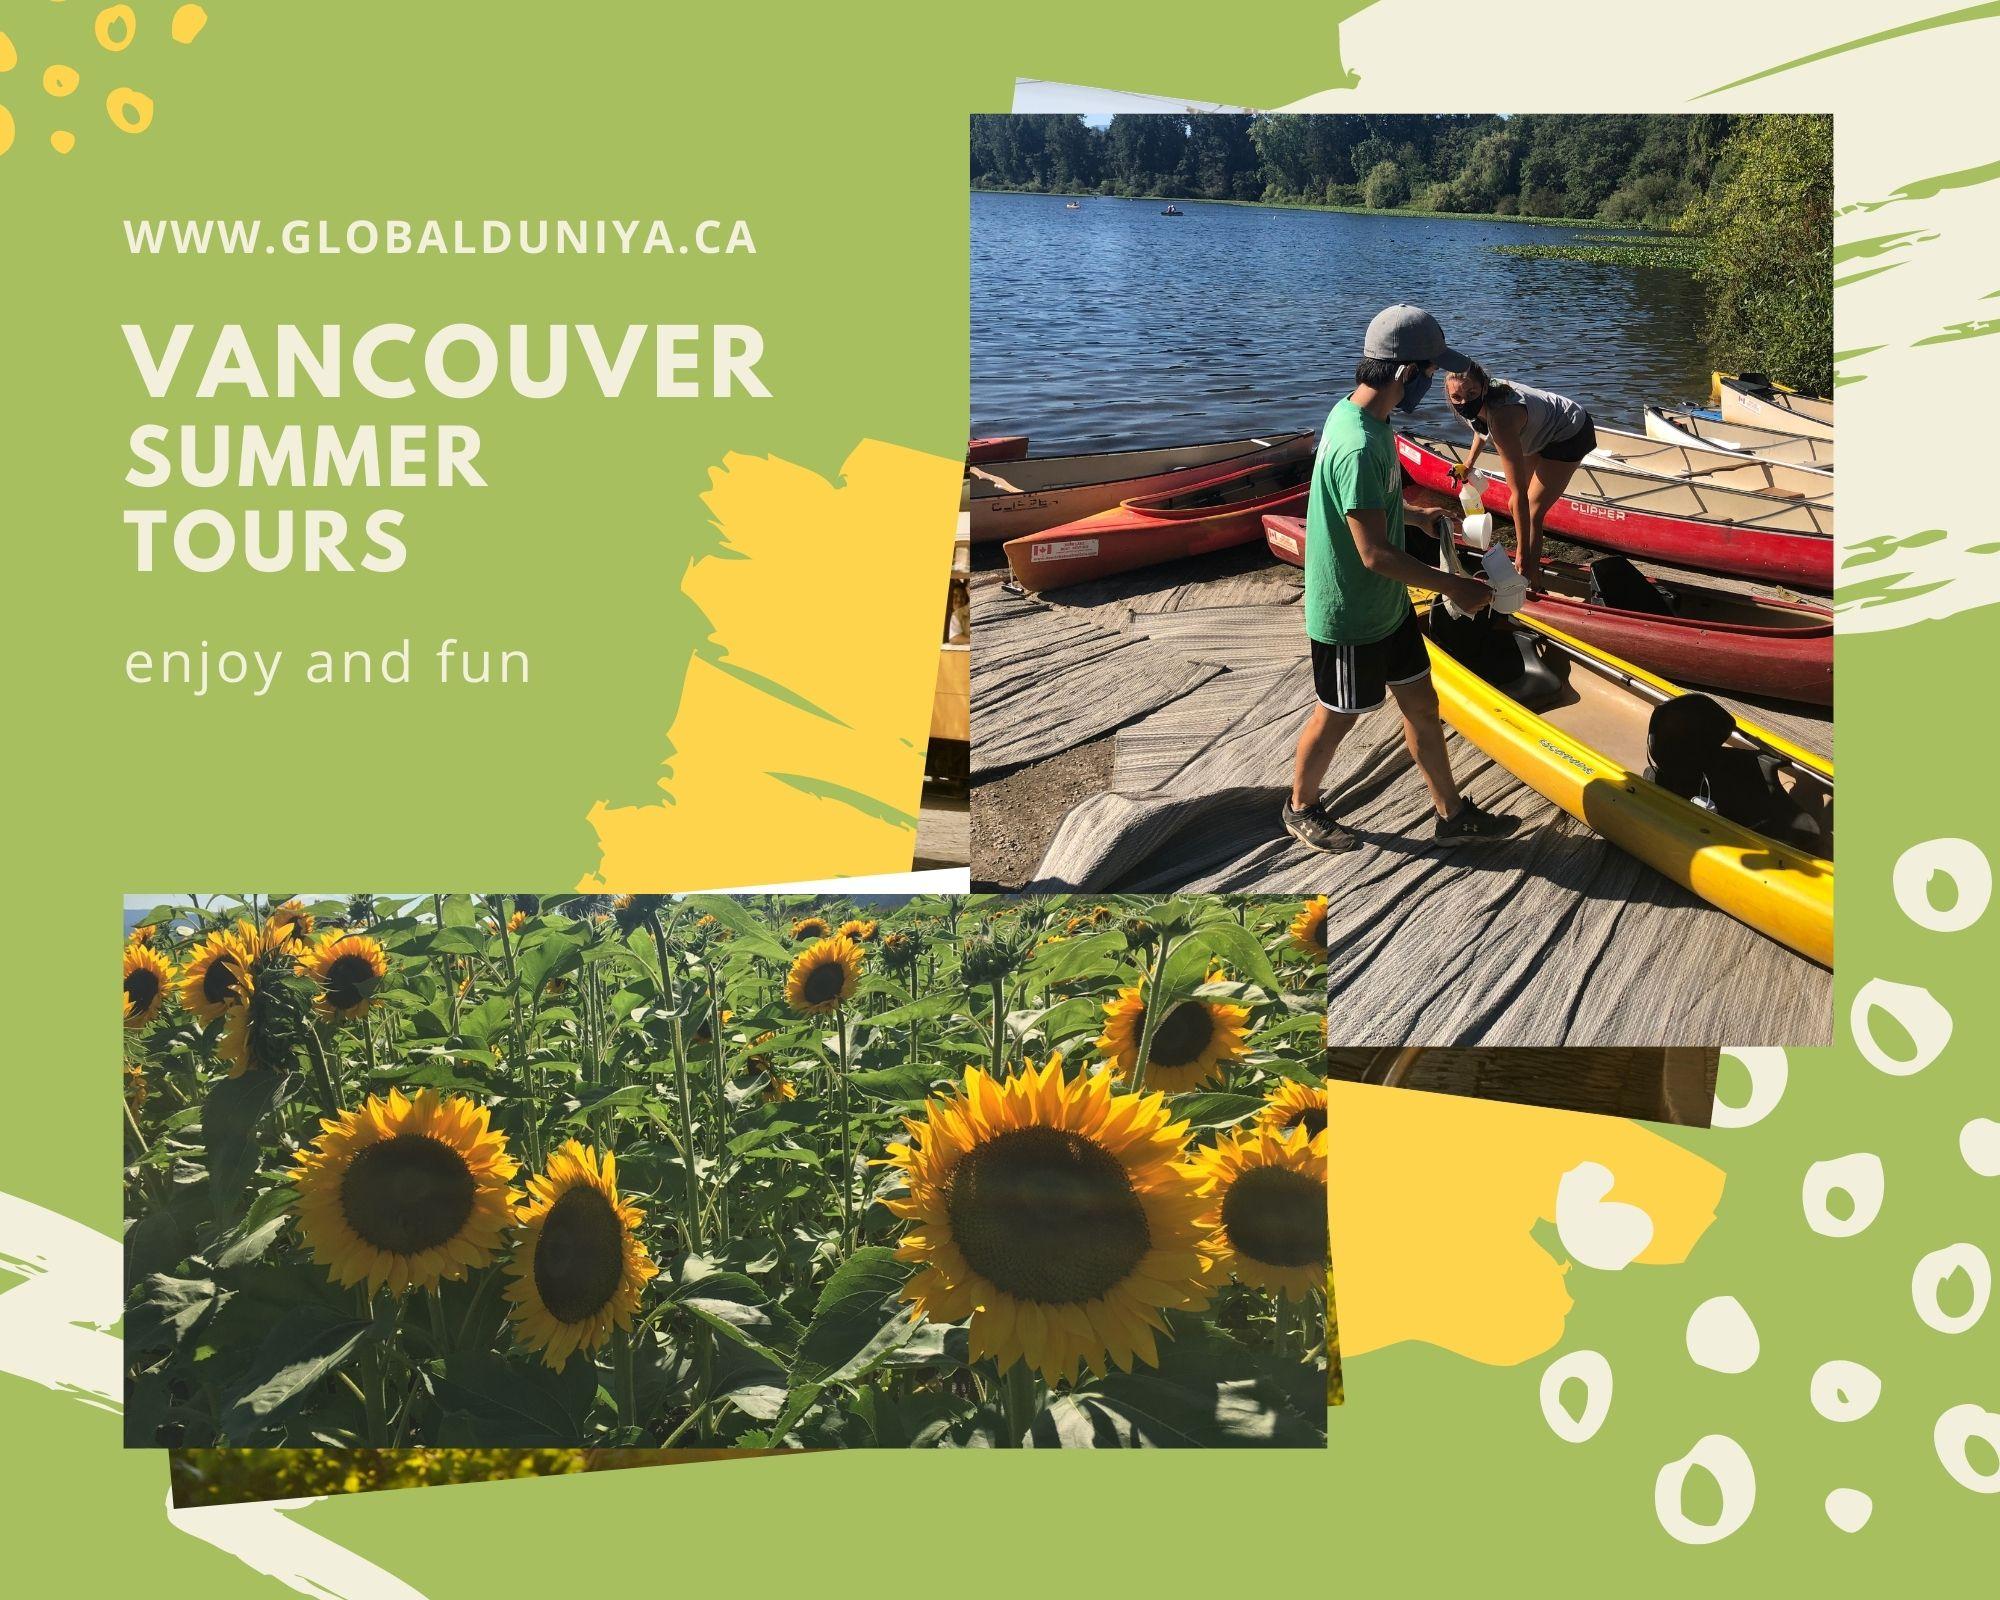 Vancouver summer tours